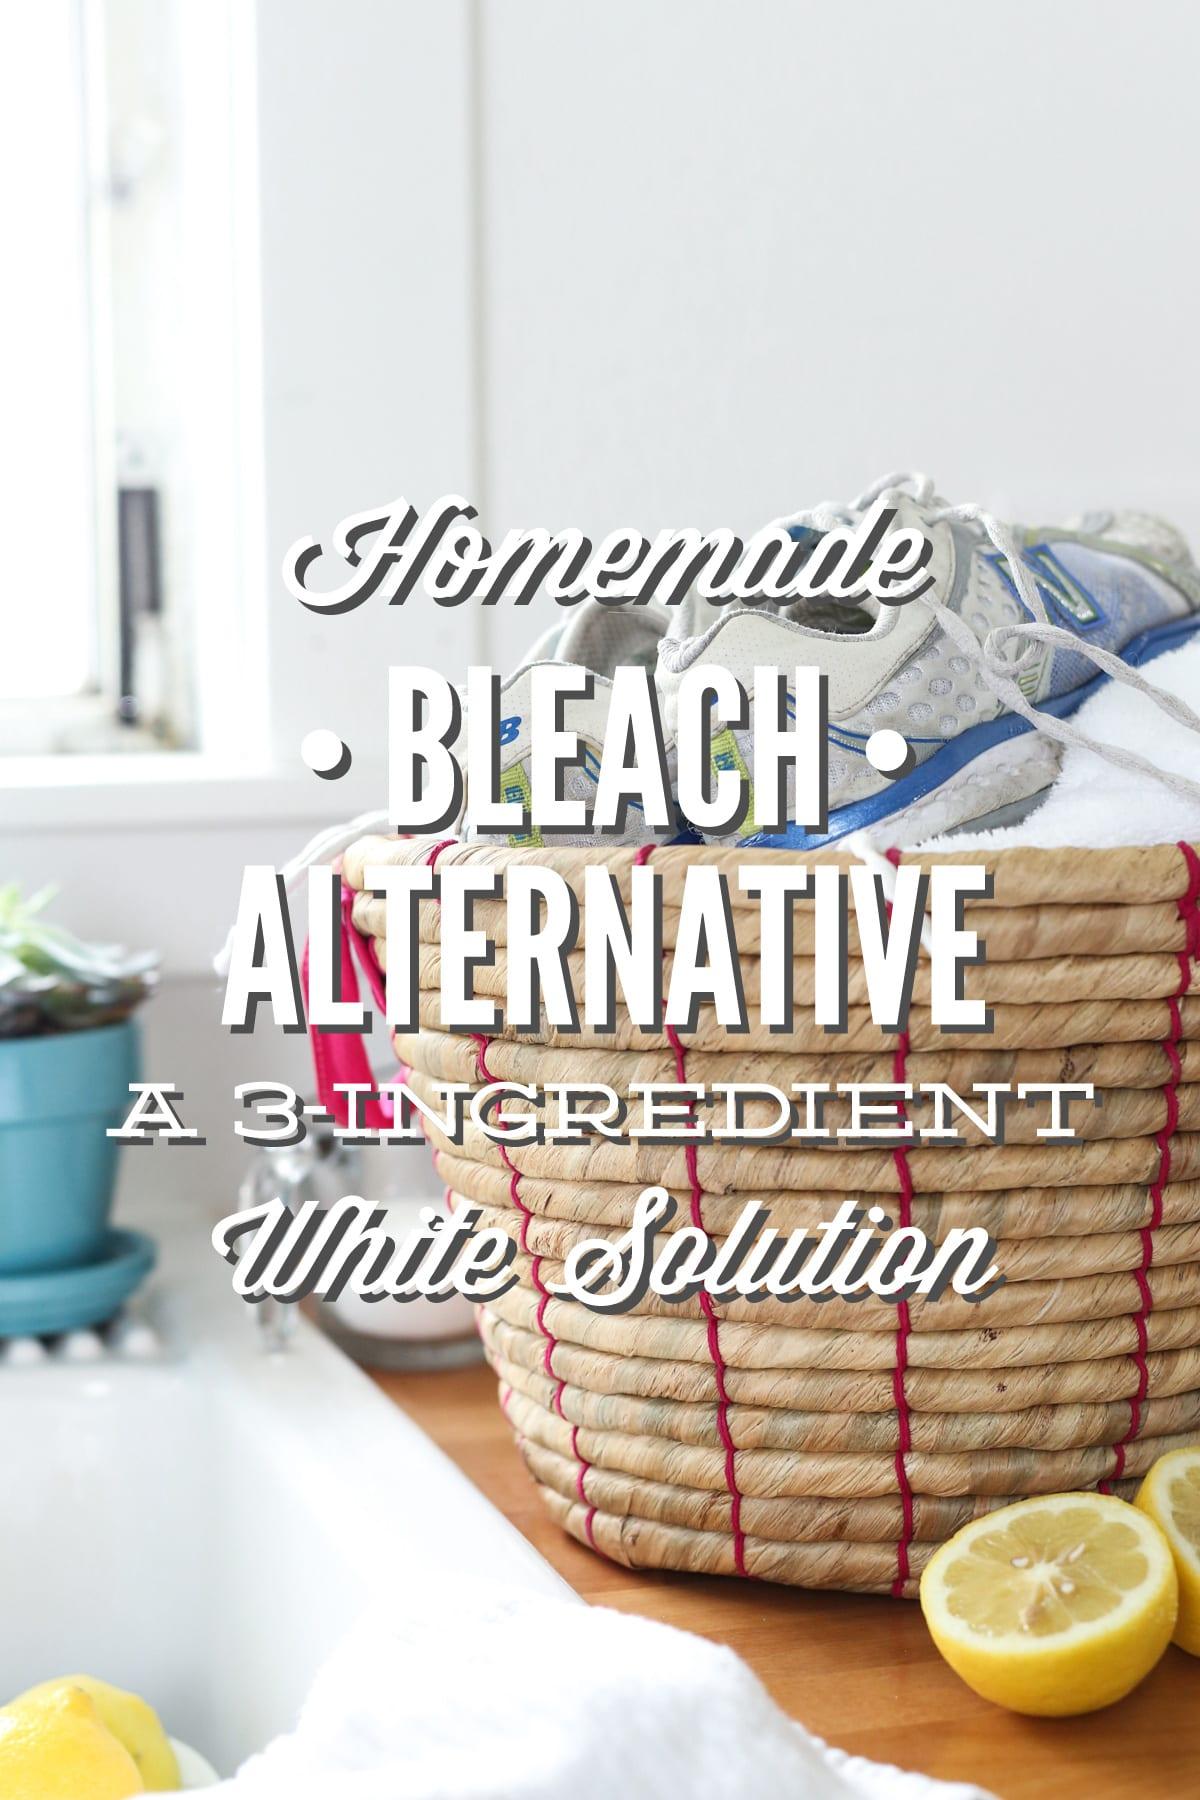 Homemade Bleach Alternative: A 3-Ingredient Whitening